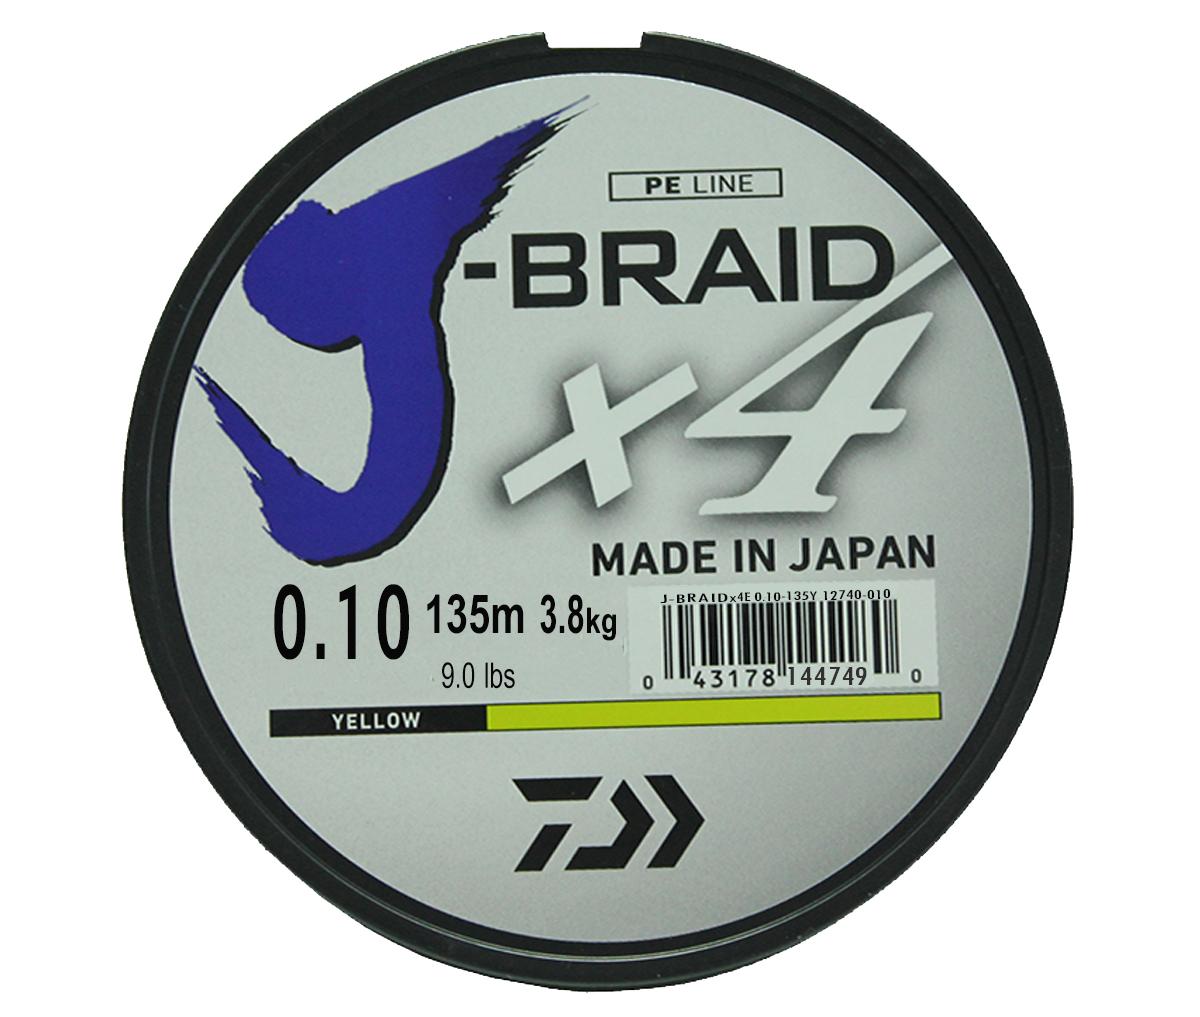 Шнур плетеный Daiwa J-Braid X4, цвет: флуоресцентный желтый, 135 м, 0,10 мм daiwa harrier x match 2553 x